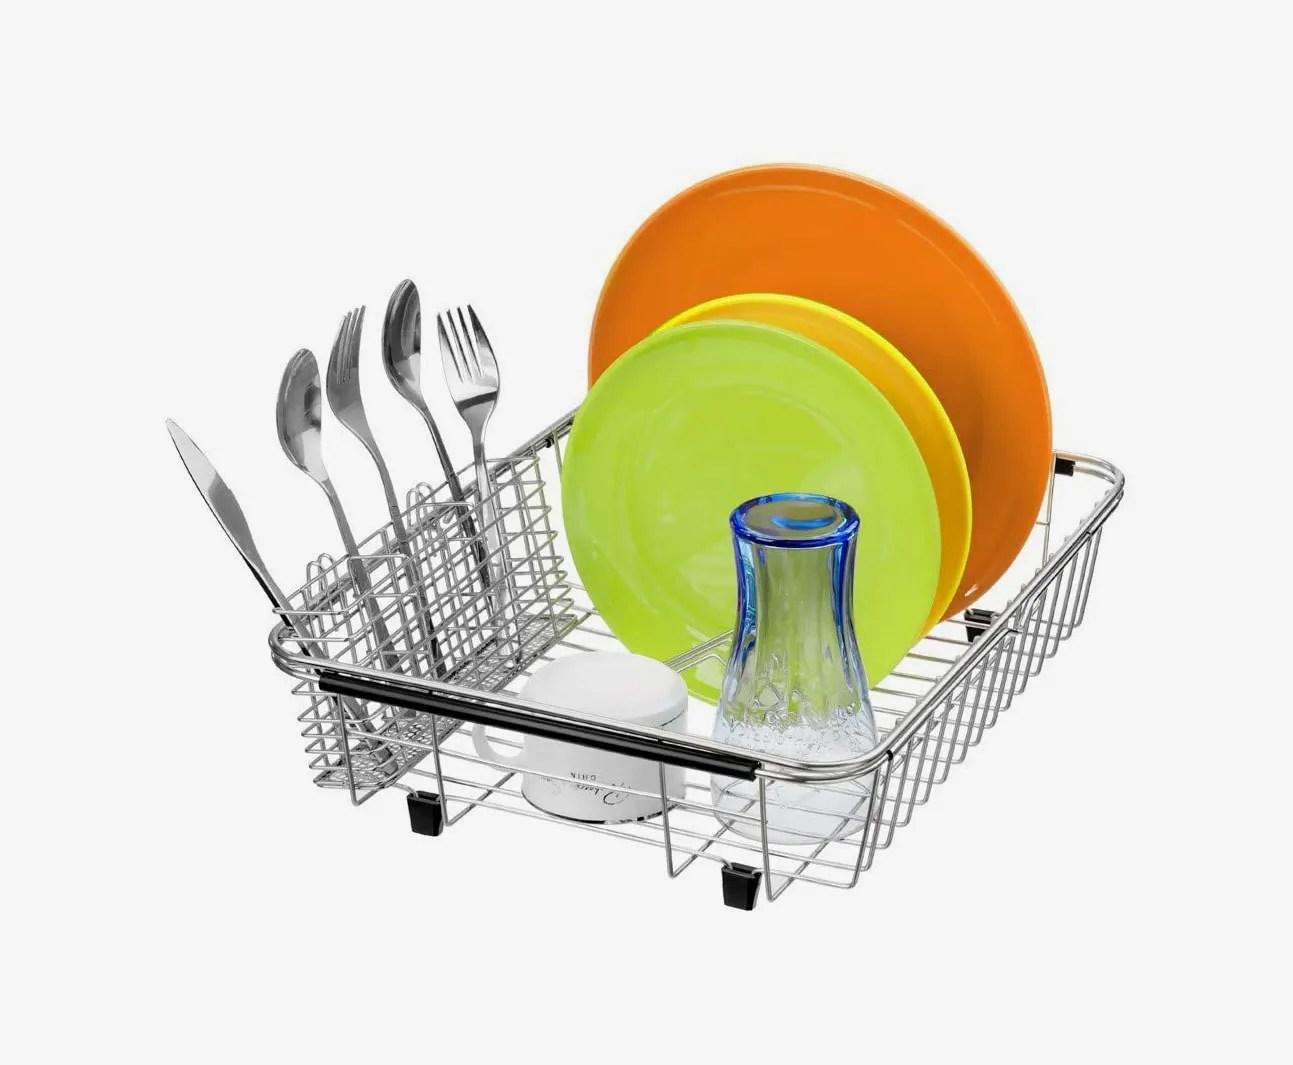 https nymag com strategist article best dish racks html